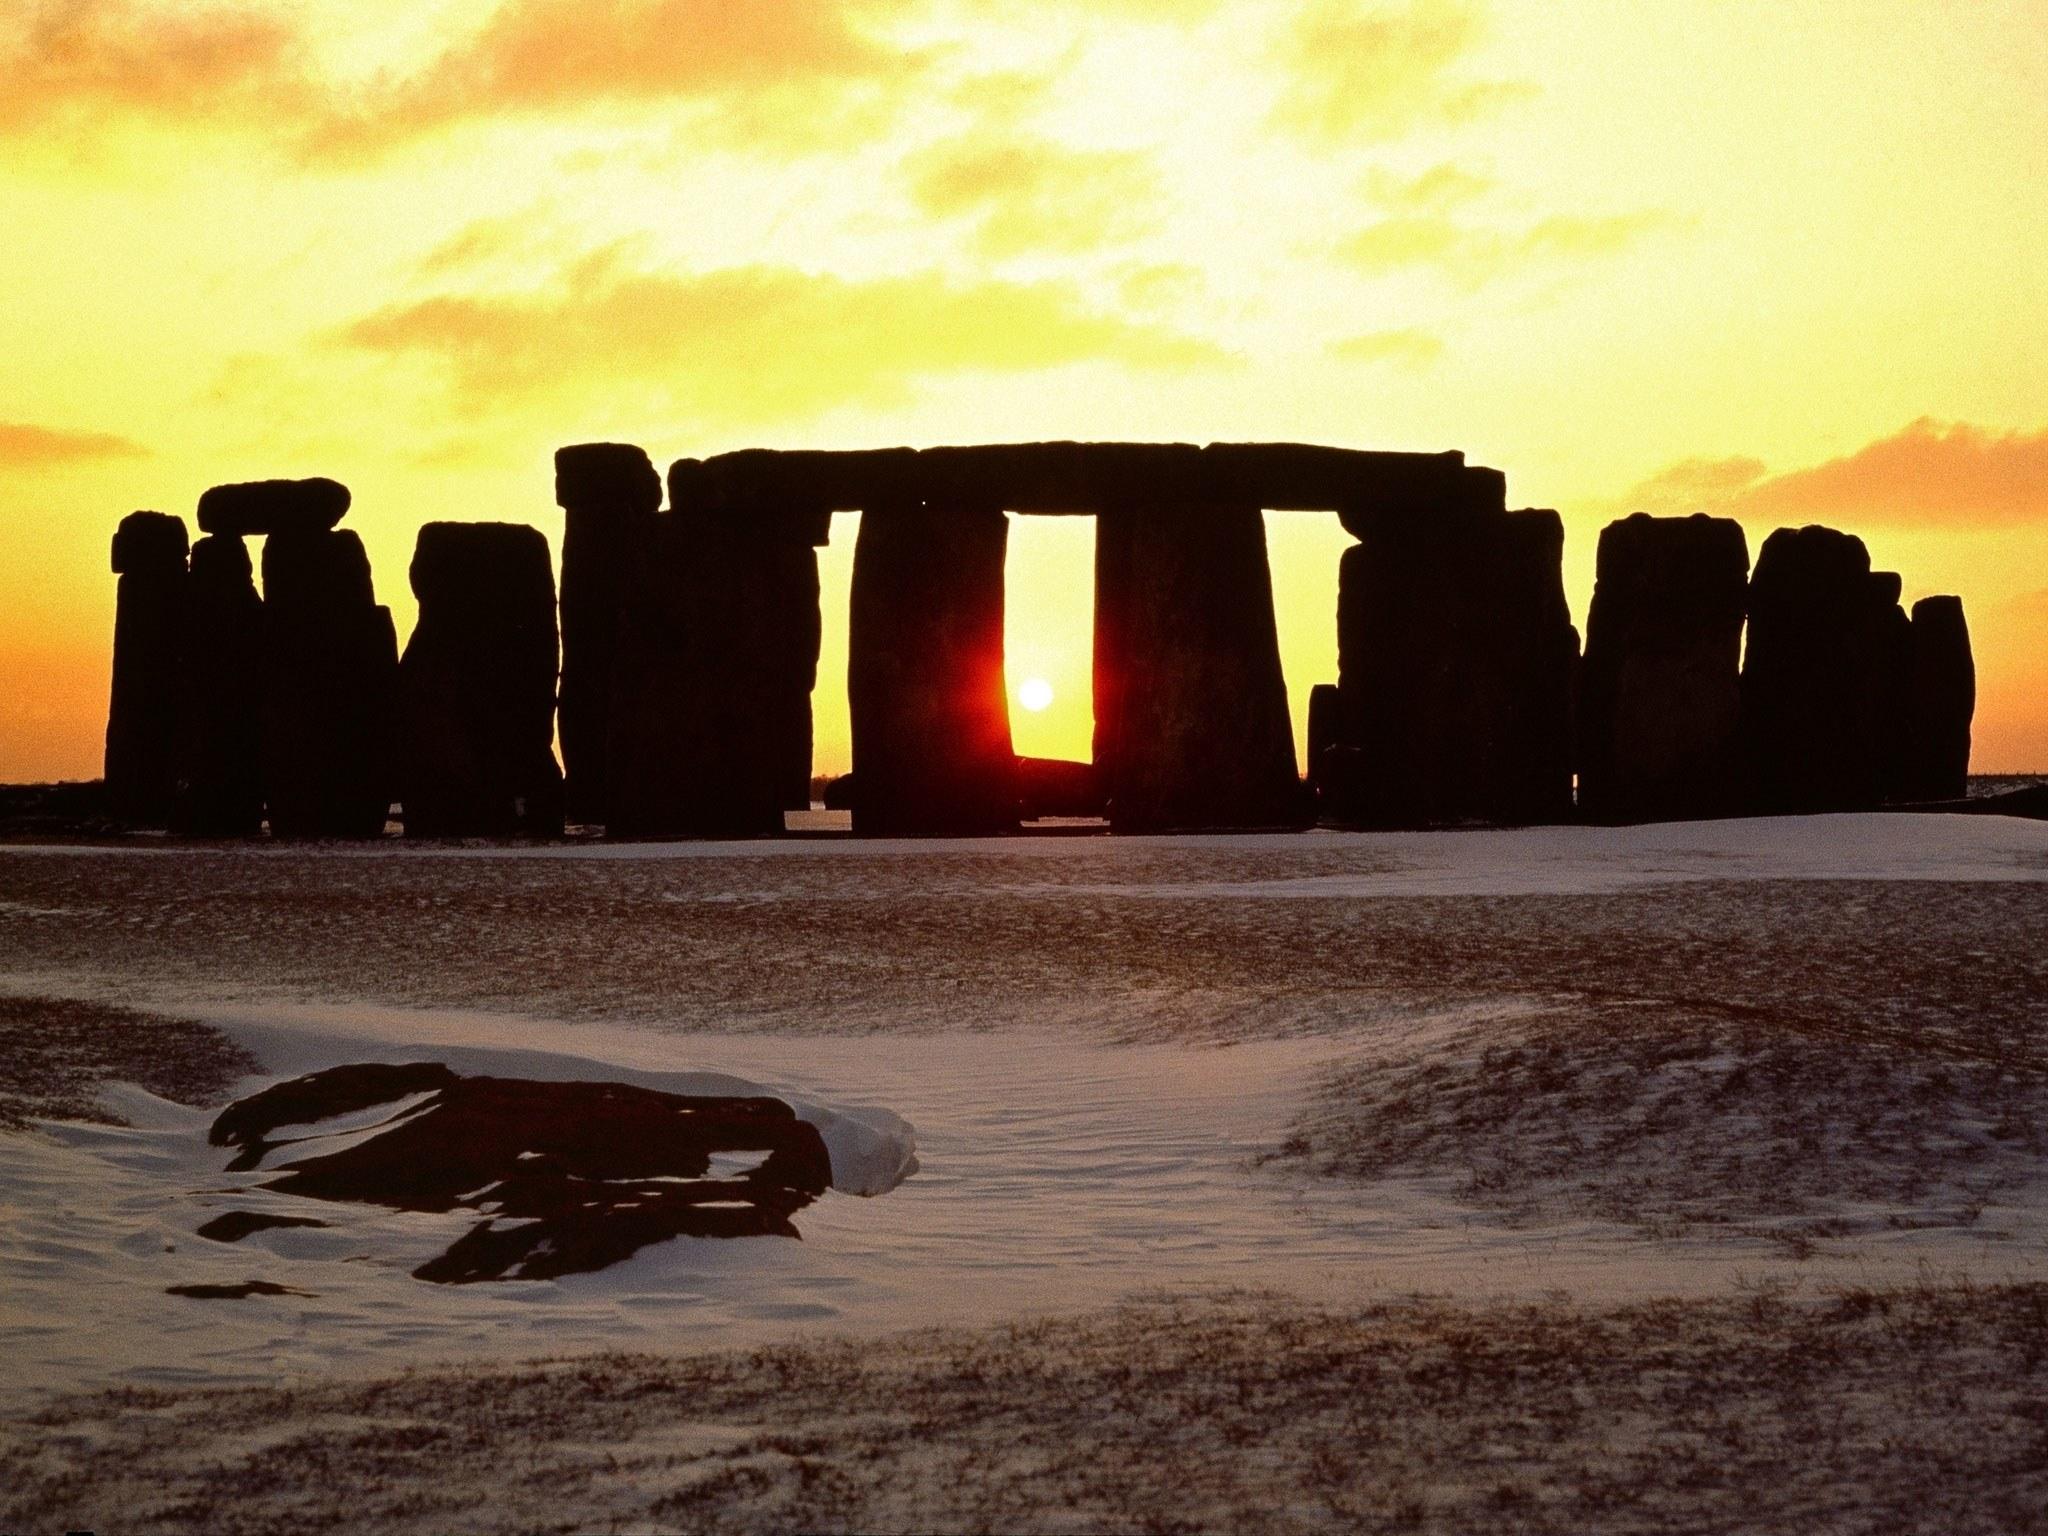 stonehenge-england-winter-solstice.jpg